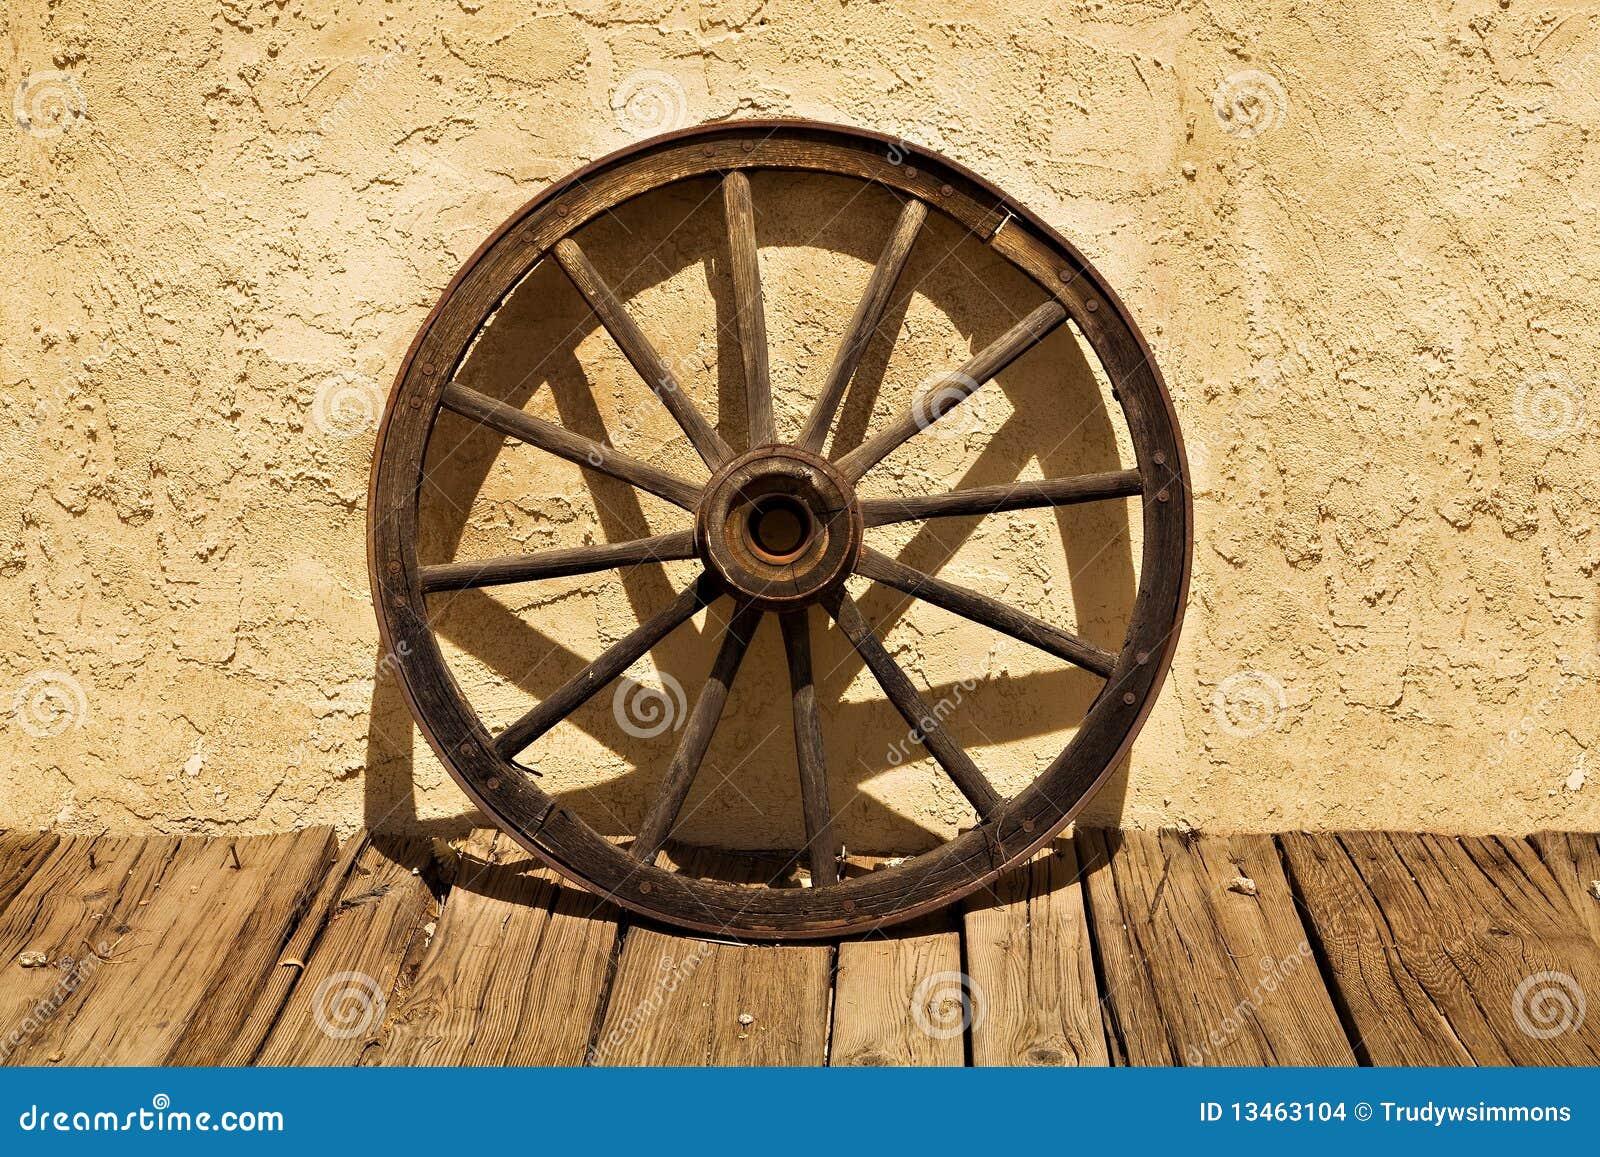 Western Wagon Wheel Clip Art Wagon wheel of the old west